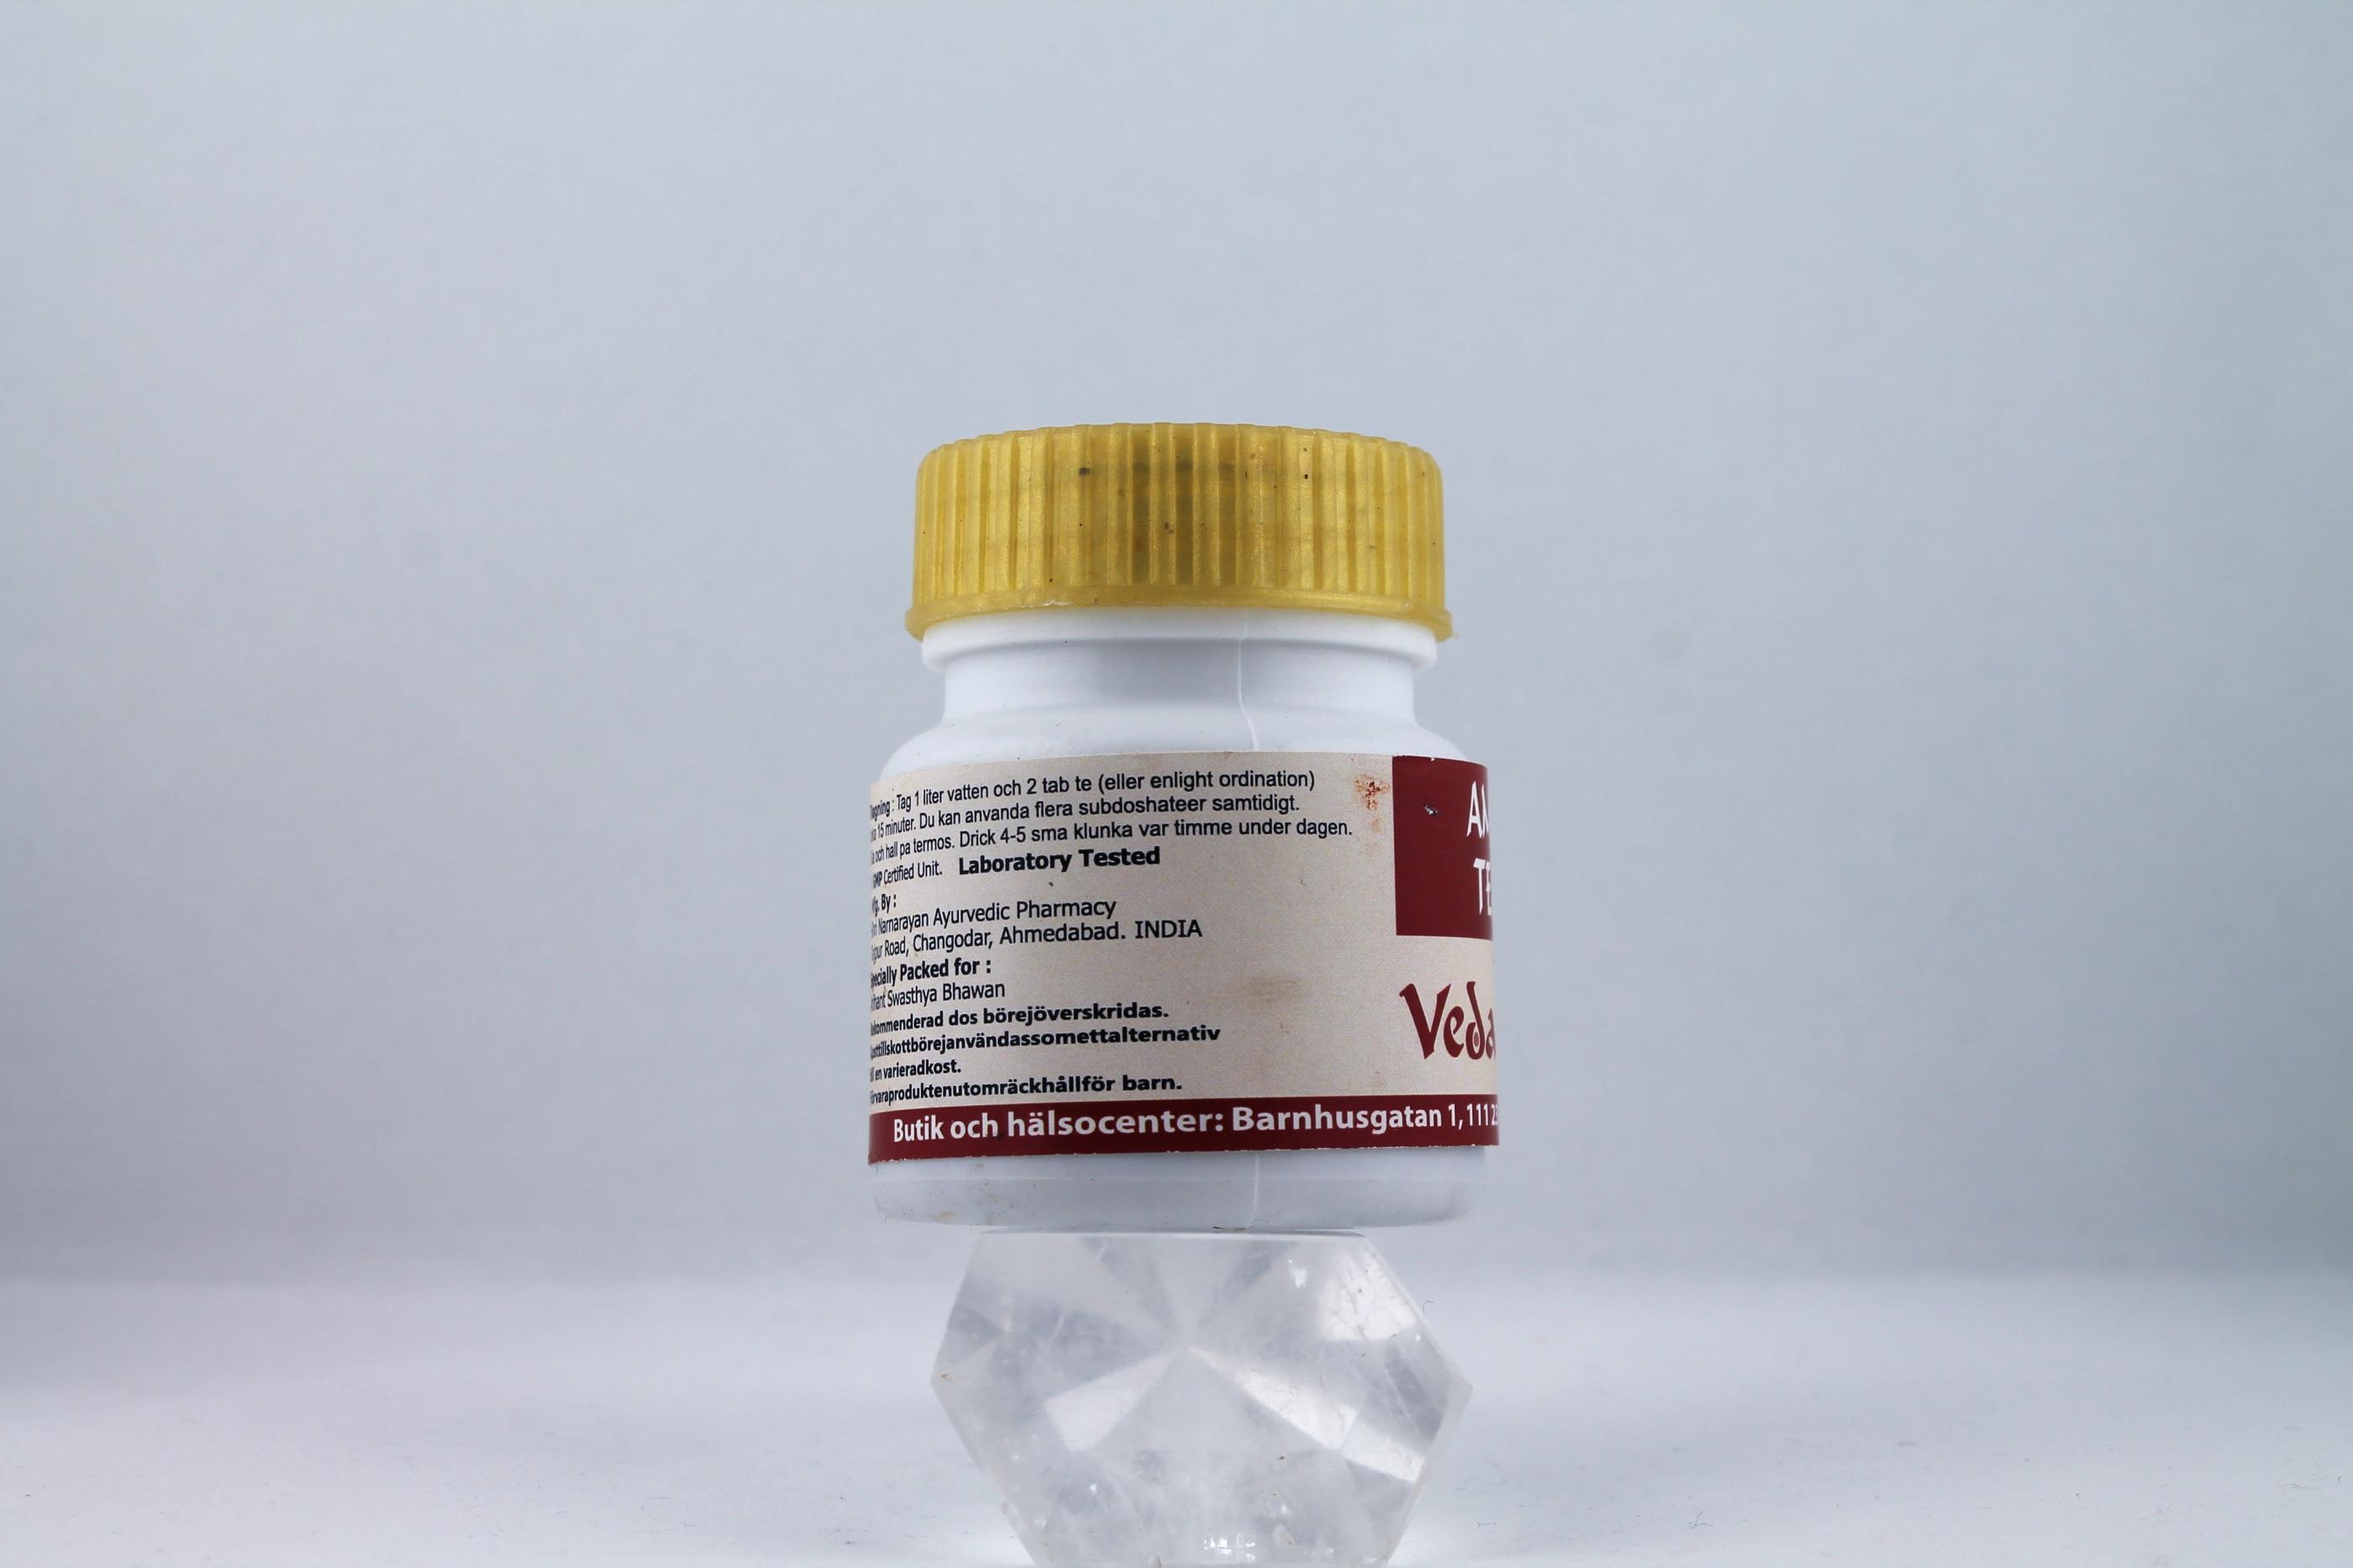 Ama Te Wellness Ayurveda Halmstadmassören Halmstad Sverige Sweden svensk tabletter